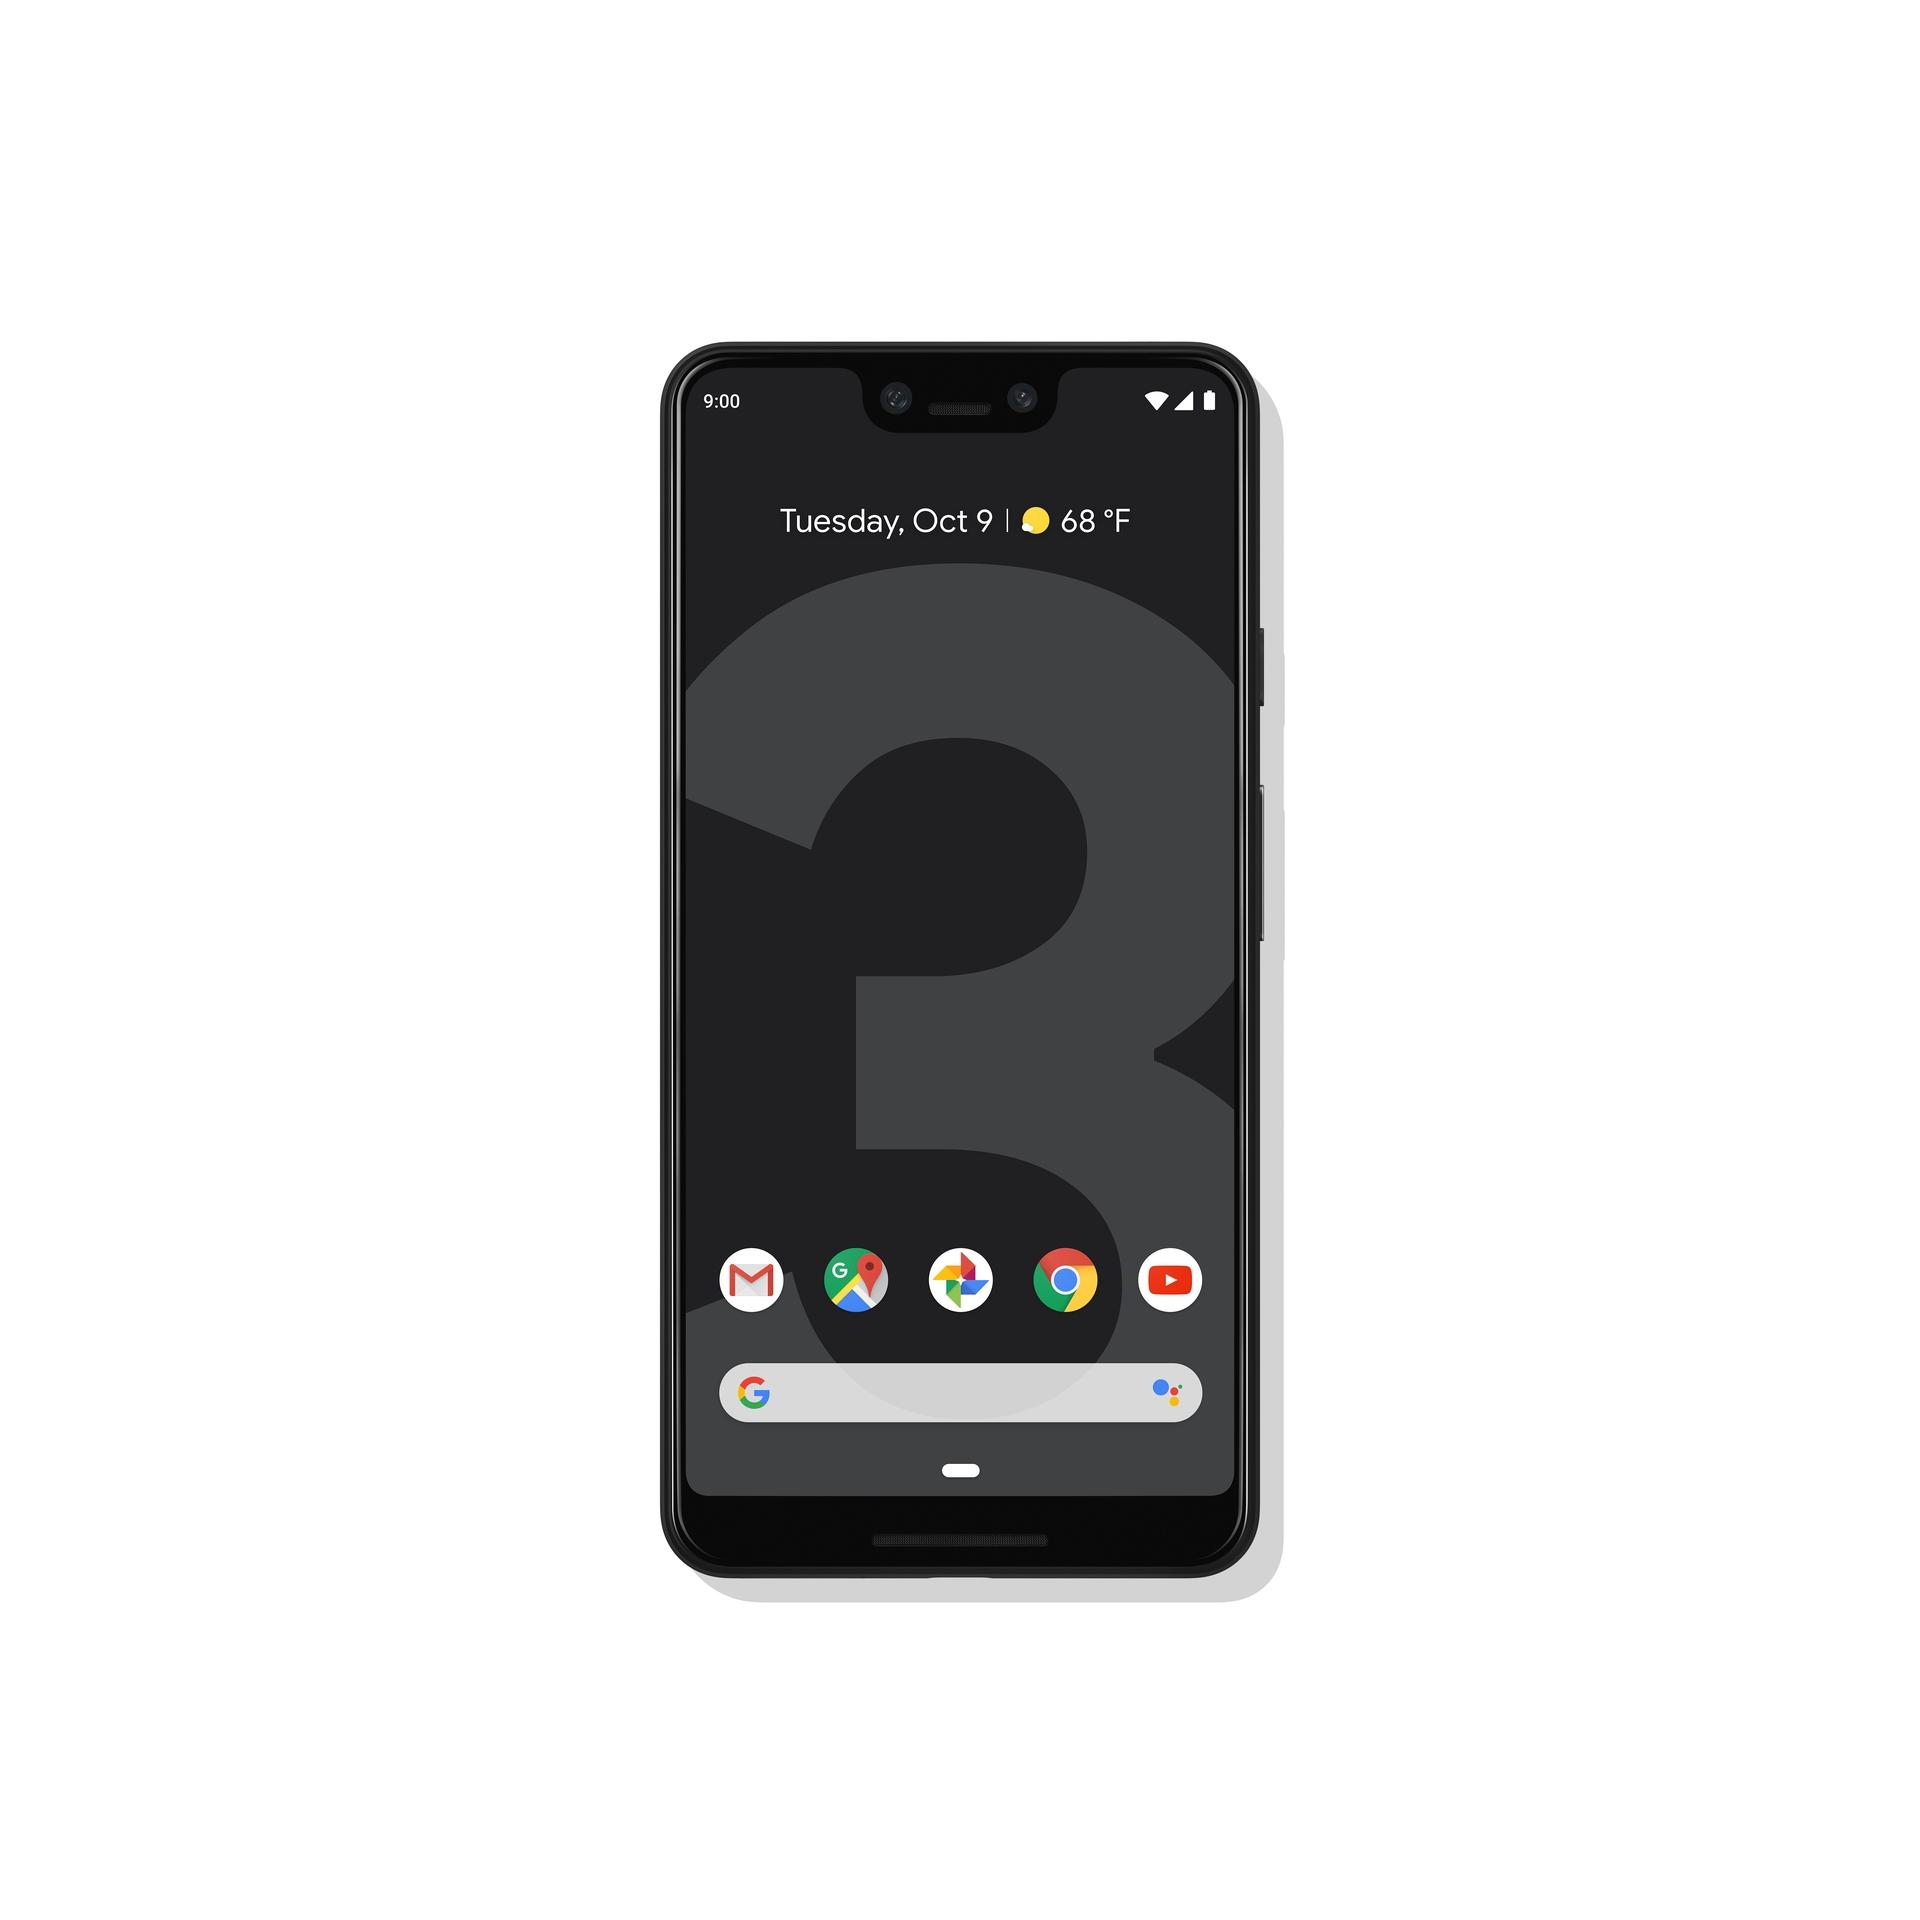 Google Pixel 3 XL in black (front)